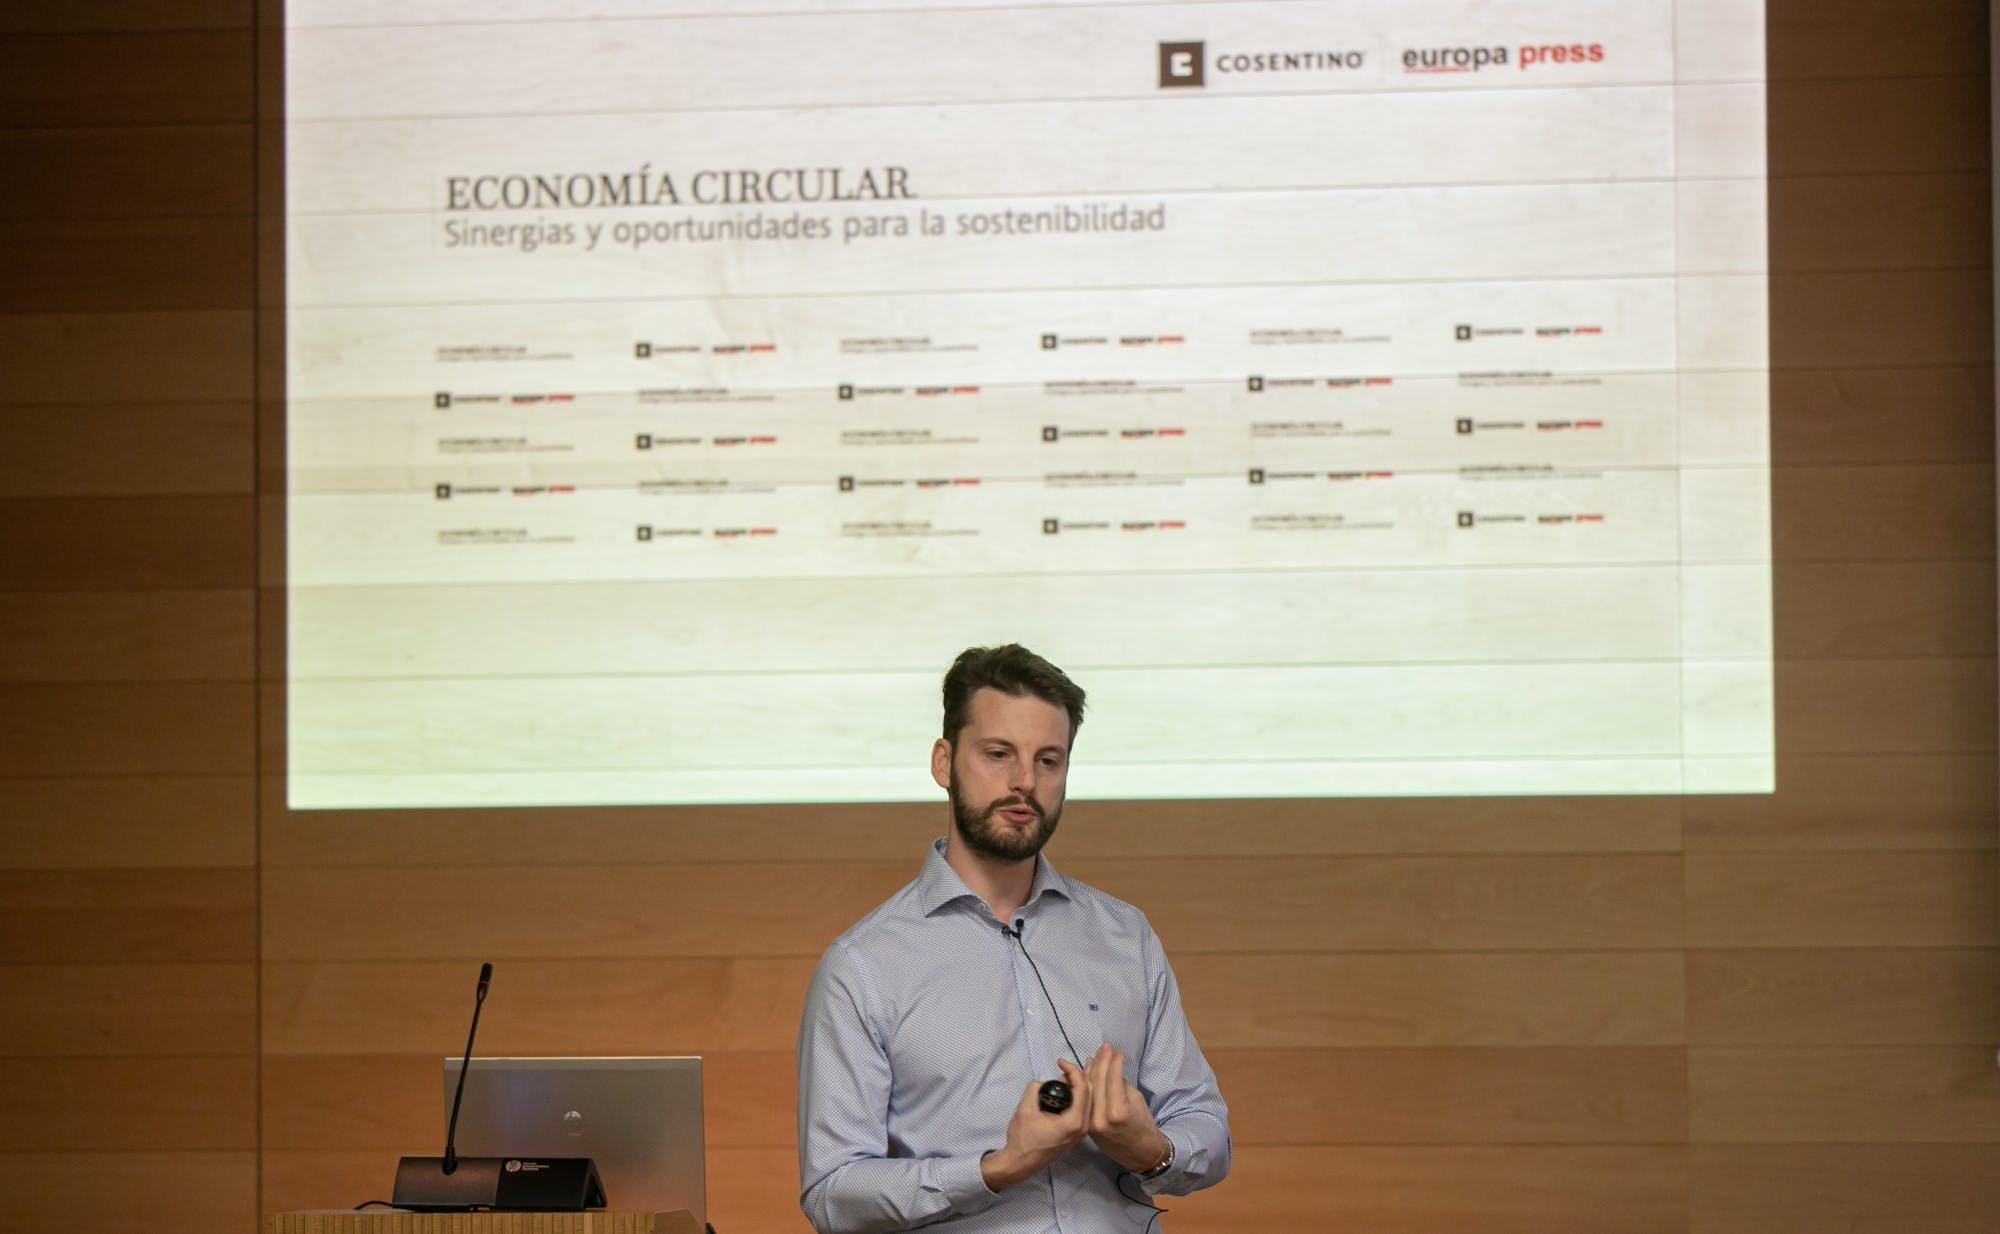 Image of Nicola Cerantola Jornada Economia Circular Cosentino 2 in Cosentino promotes the Circular Economy and Industrial Simbiosis - Cosentino